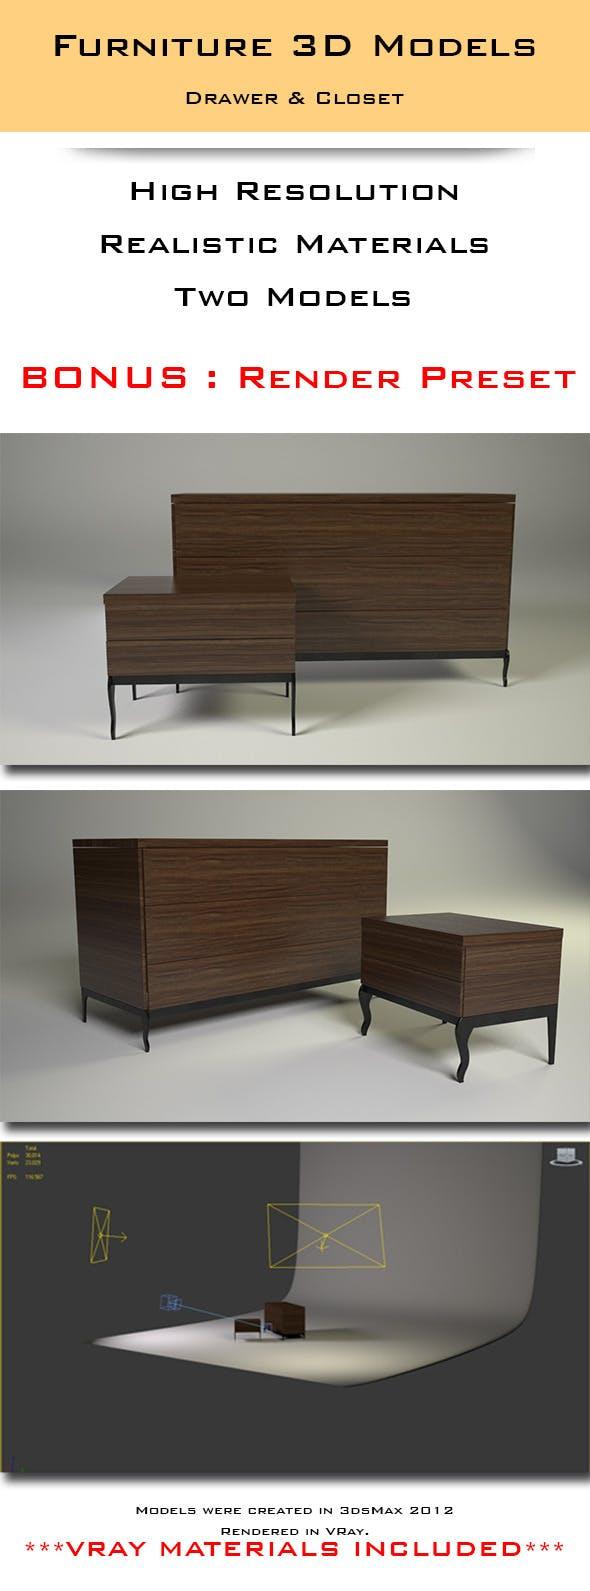 Closet & Drawer - 3DOcean Item for Sale